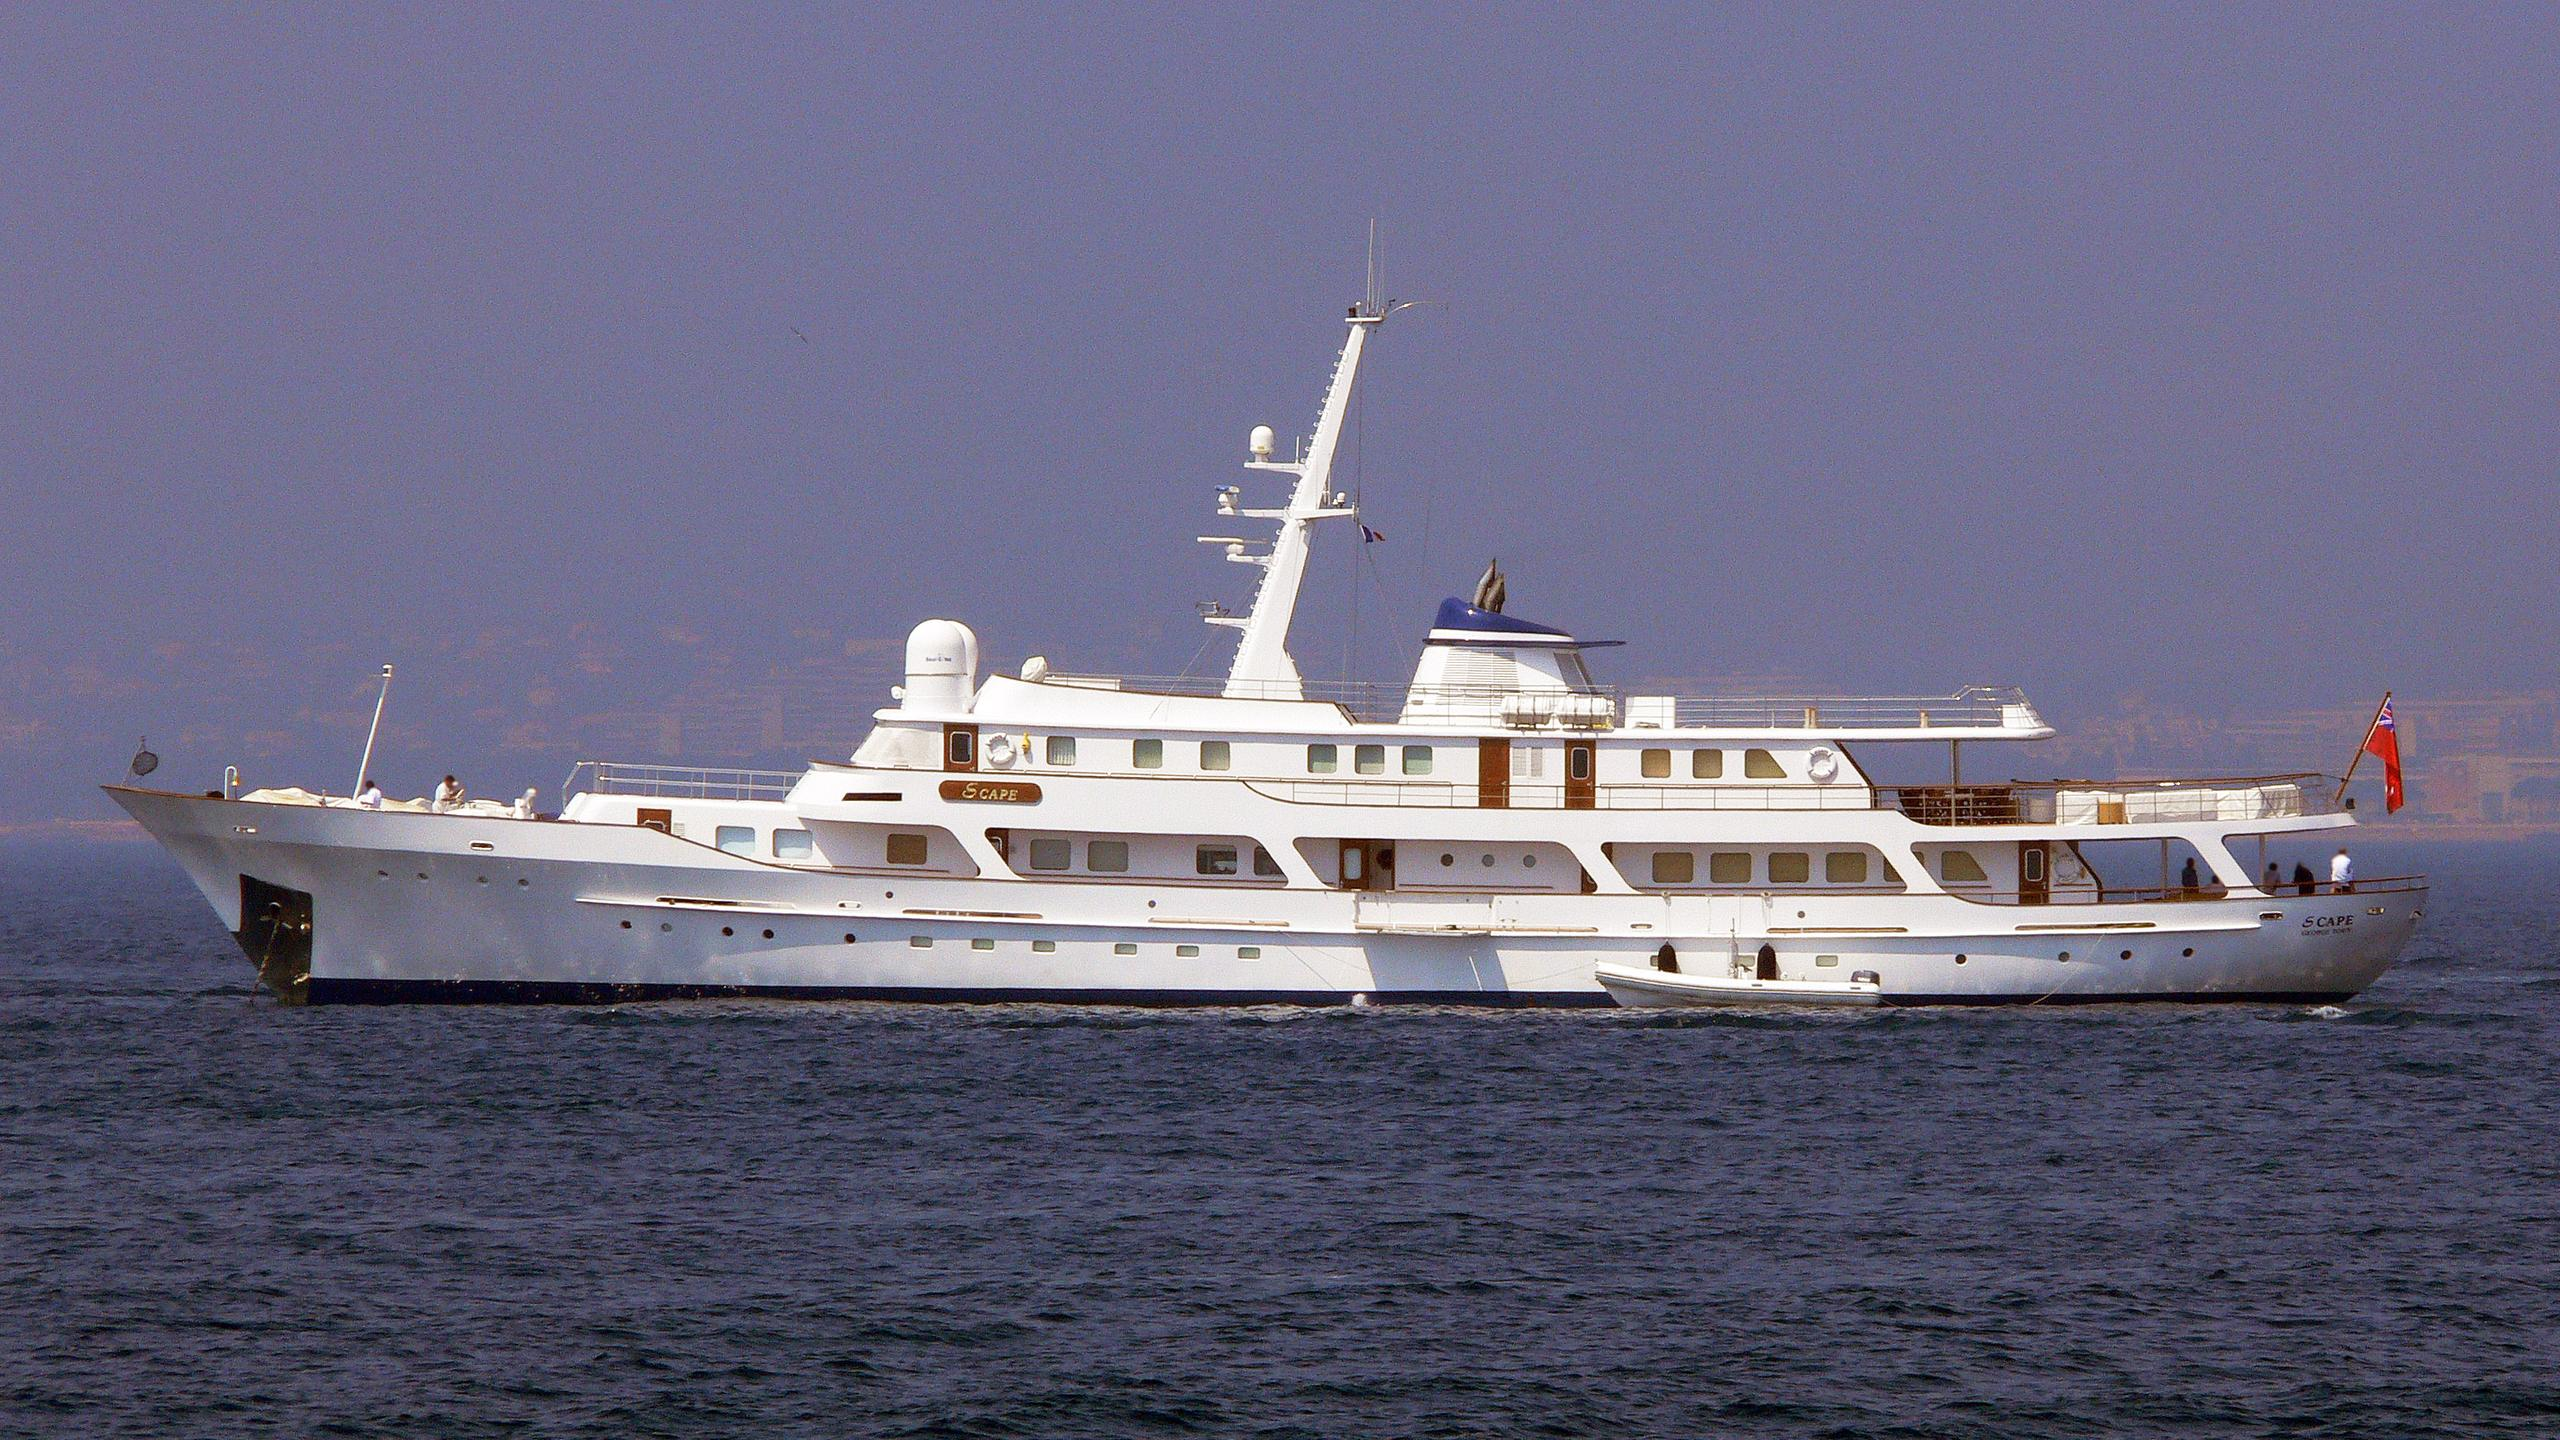 meserret-ii-motor-yacht-cammenga-1978-57m-before-refit